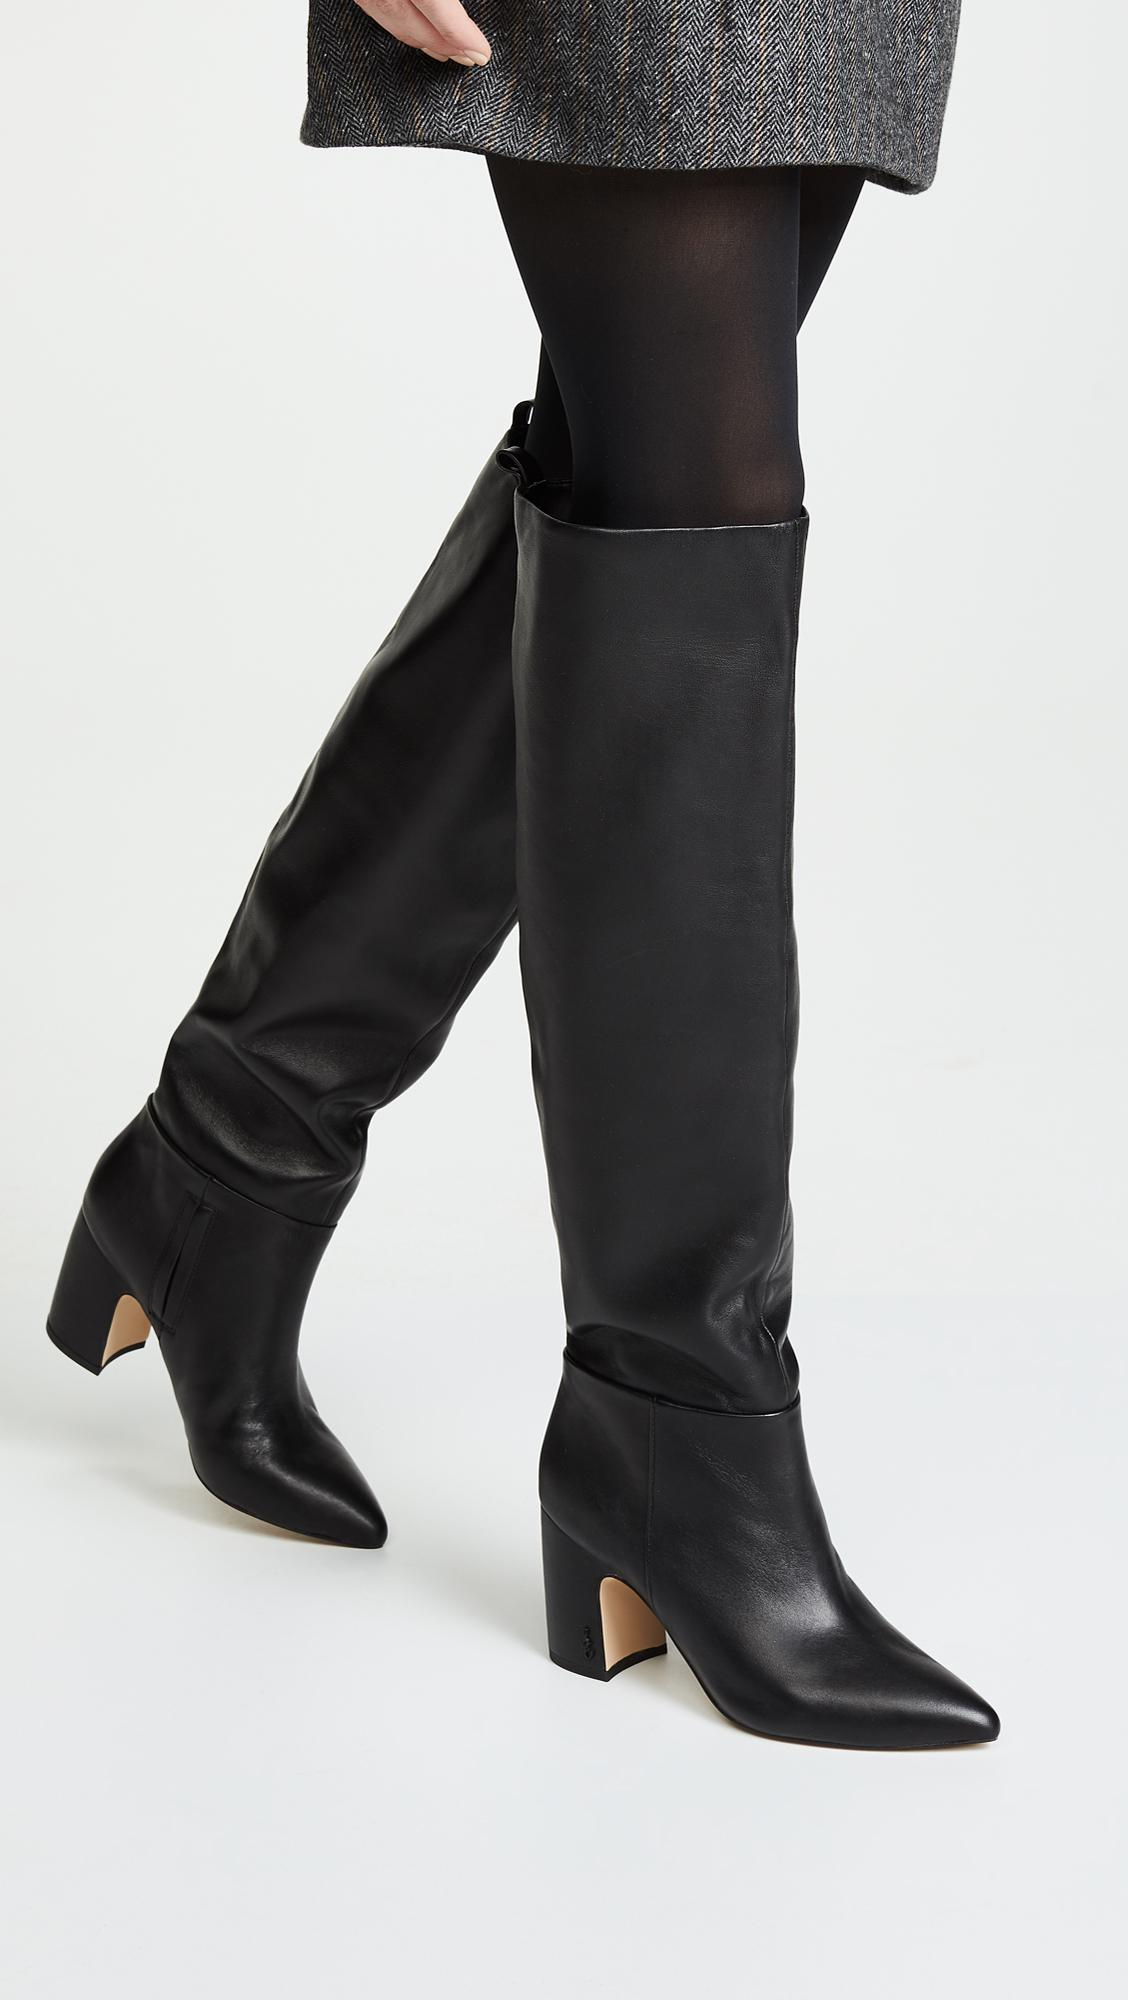 eec60fcd7c43 Sam Edelman - Black Hutton Tall Boots - Lyst. View fullscreen